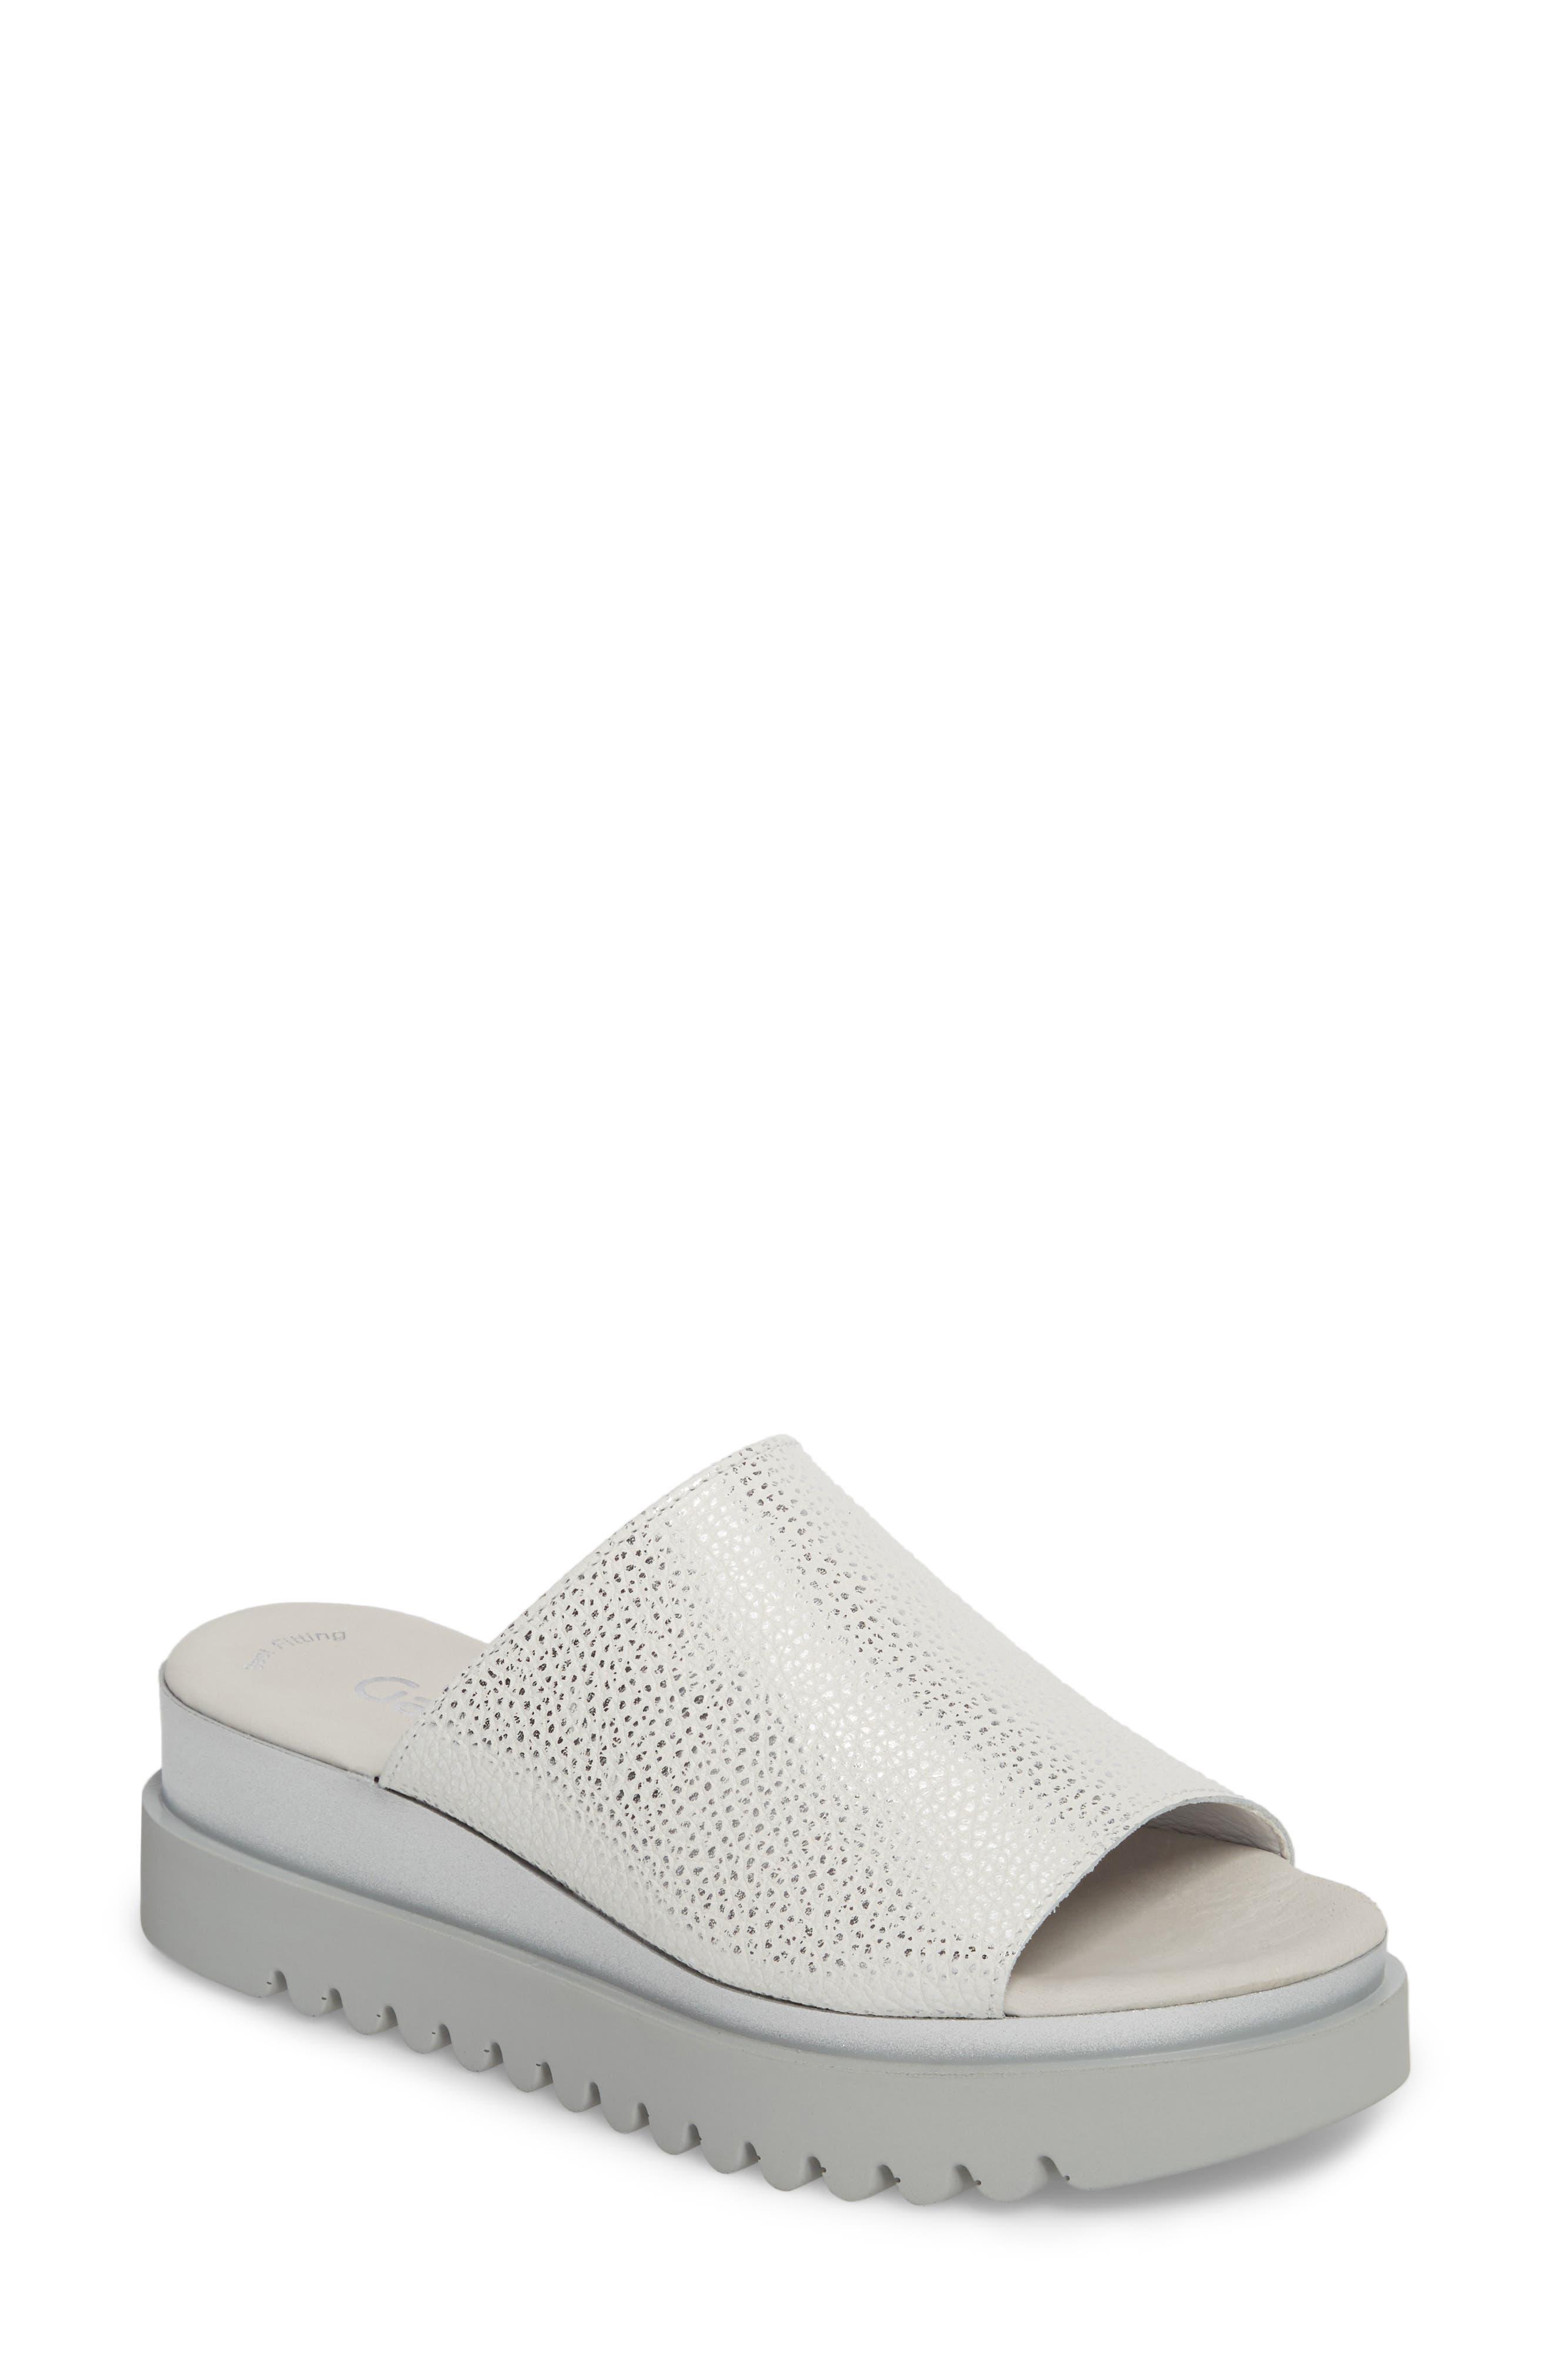 Platform Slide Sandal,                             Main thumbnail 1, color,                             WHITE LEATHER